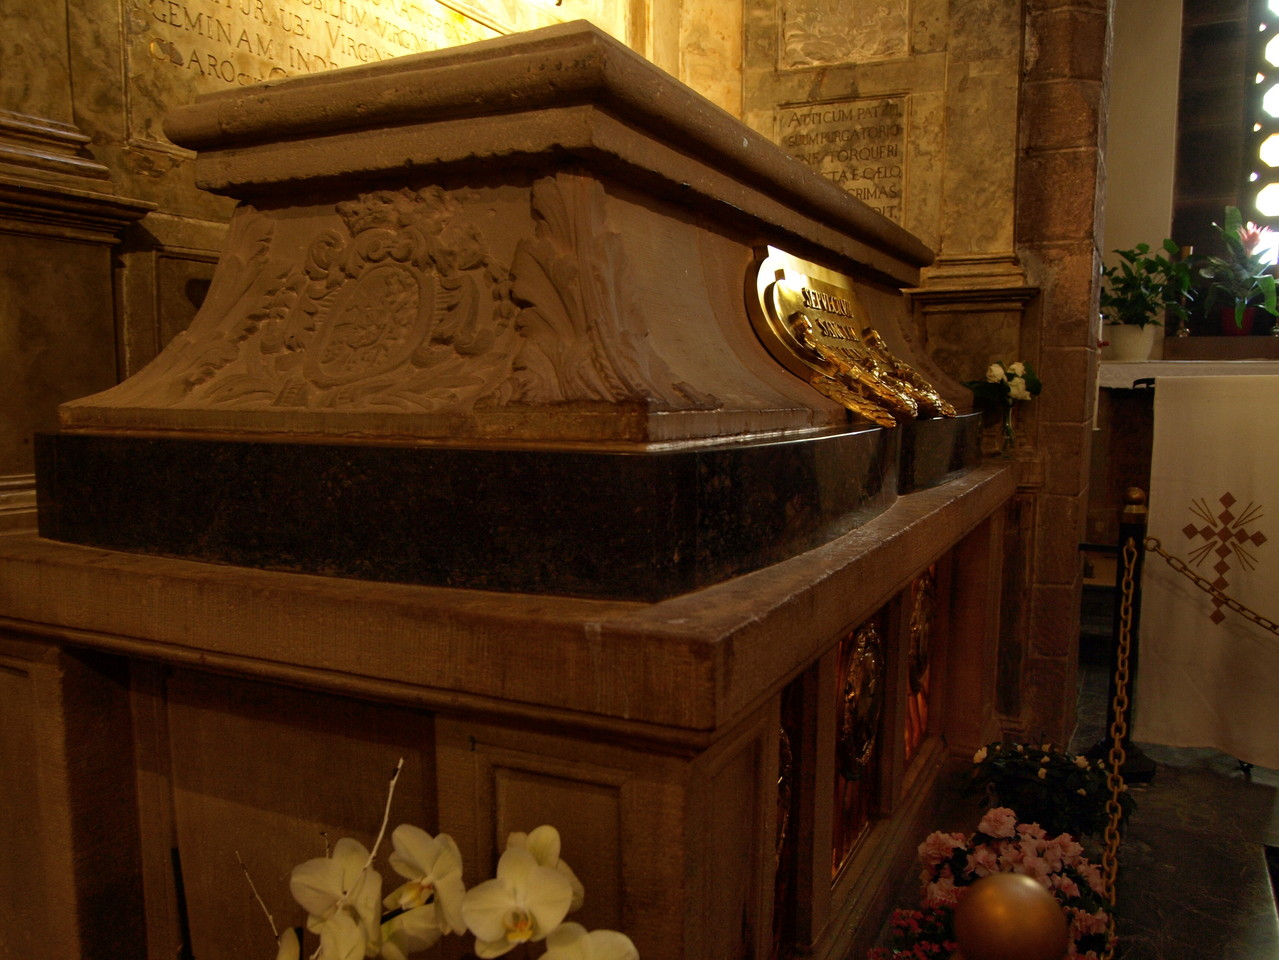 Le tombeau de Sainte Odile